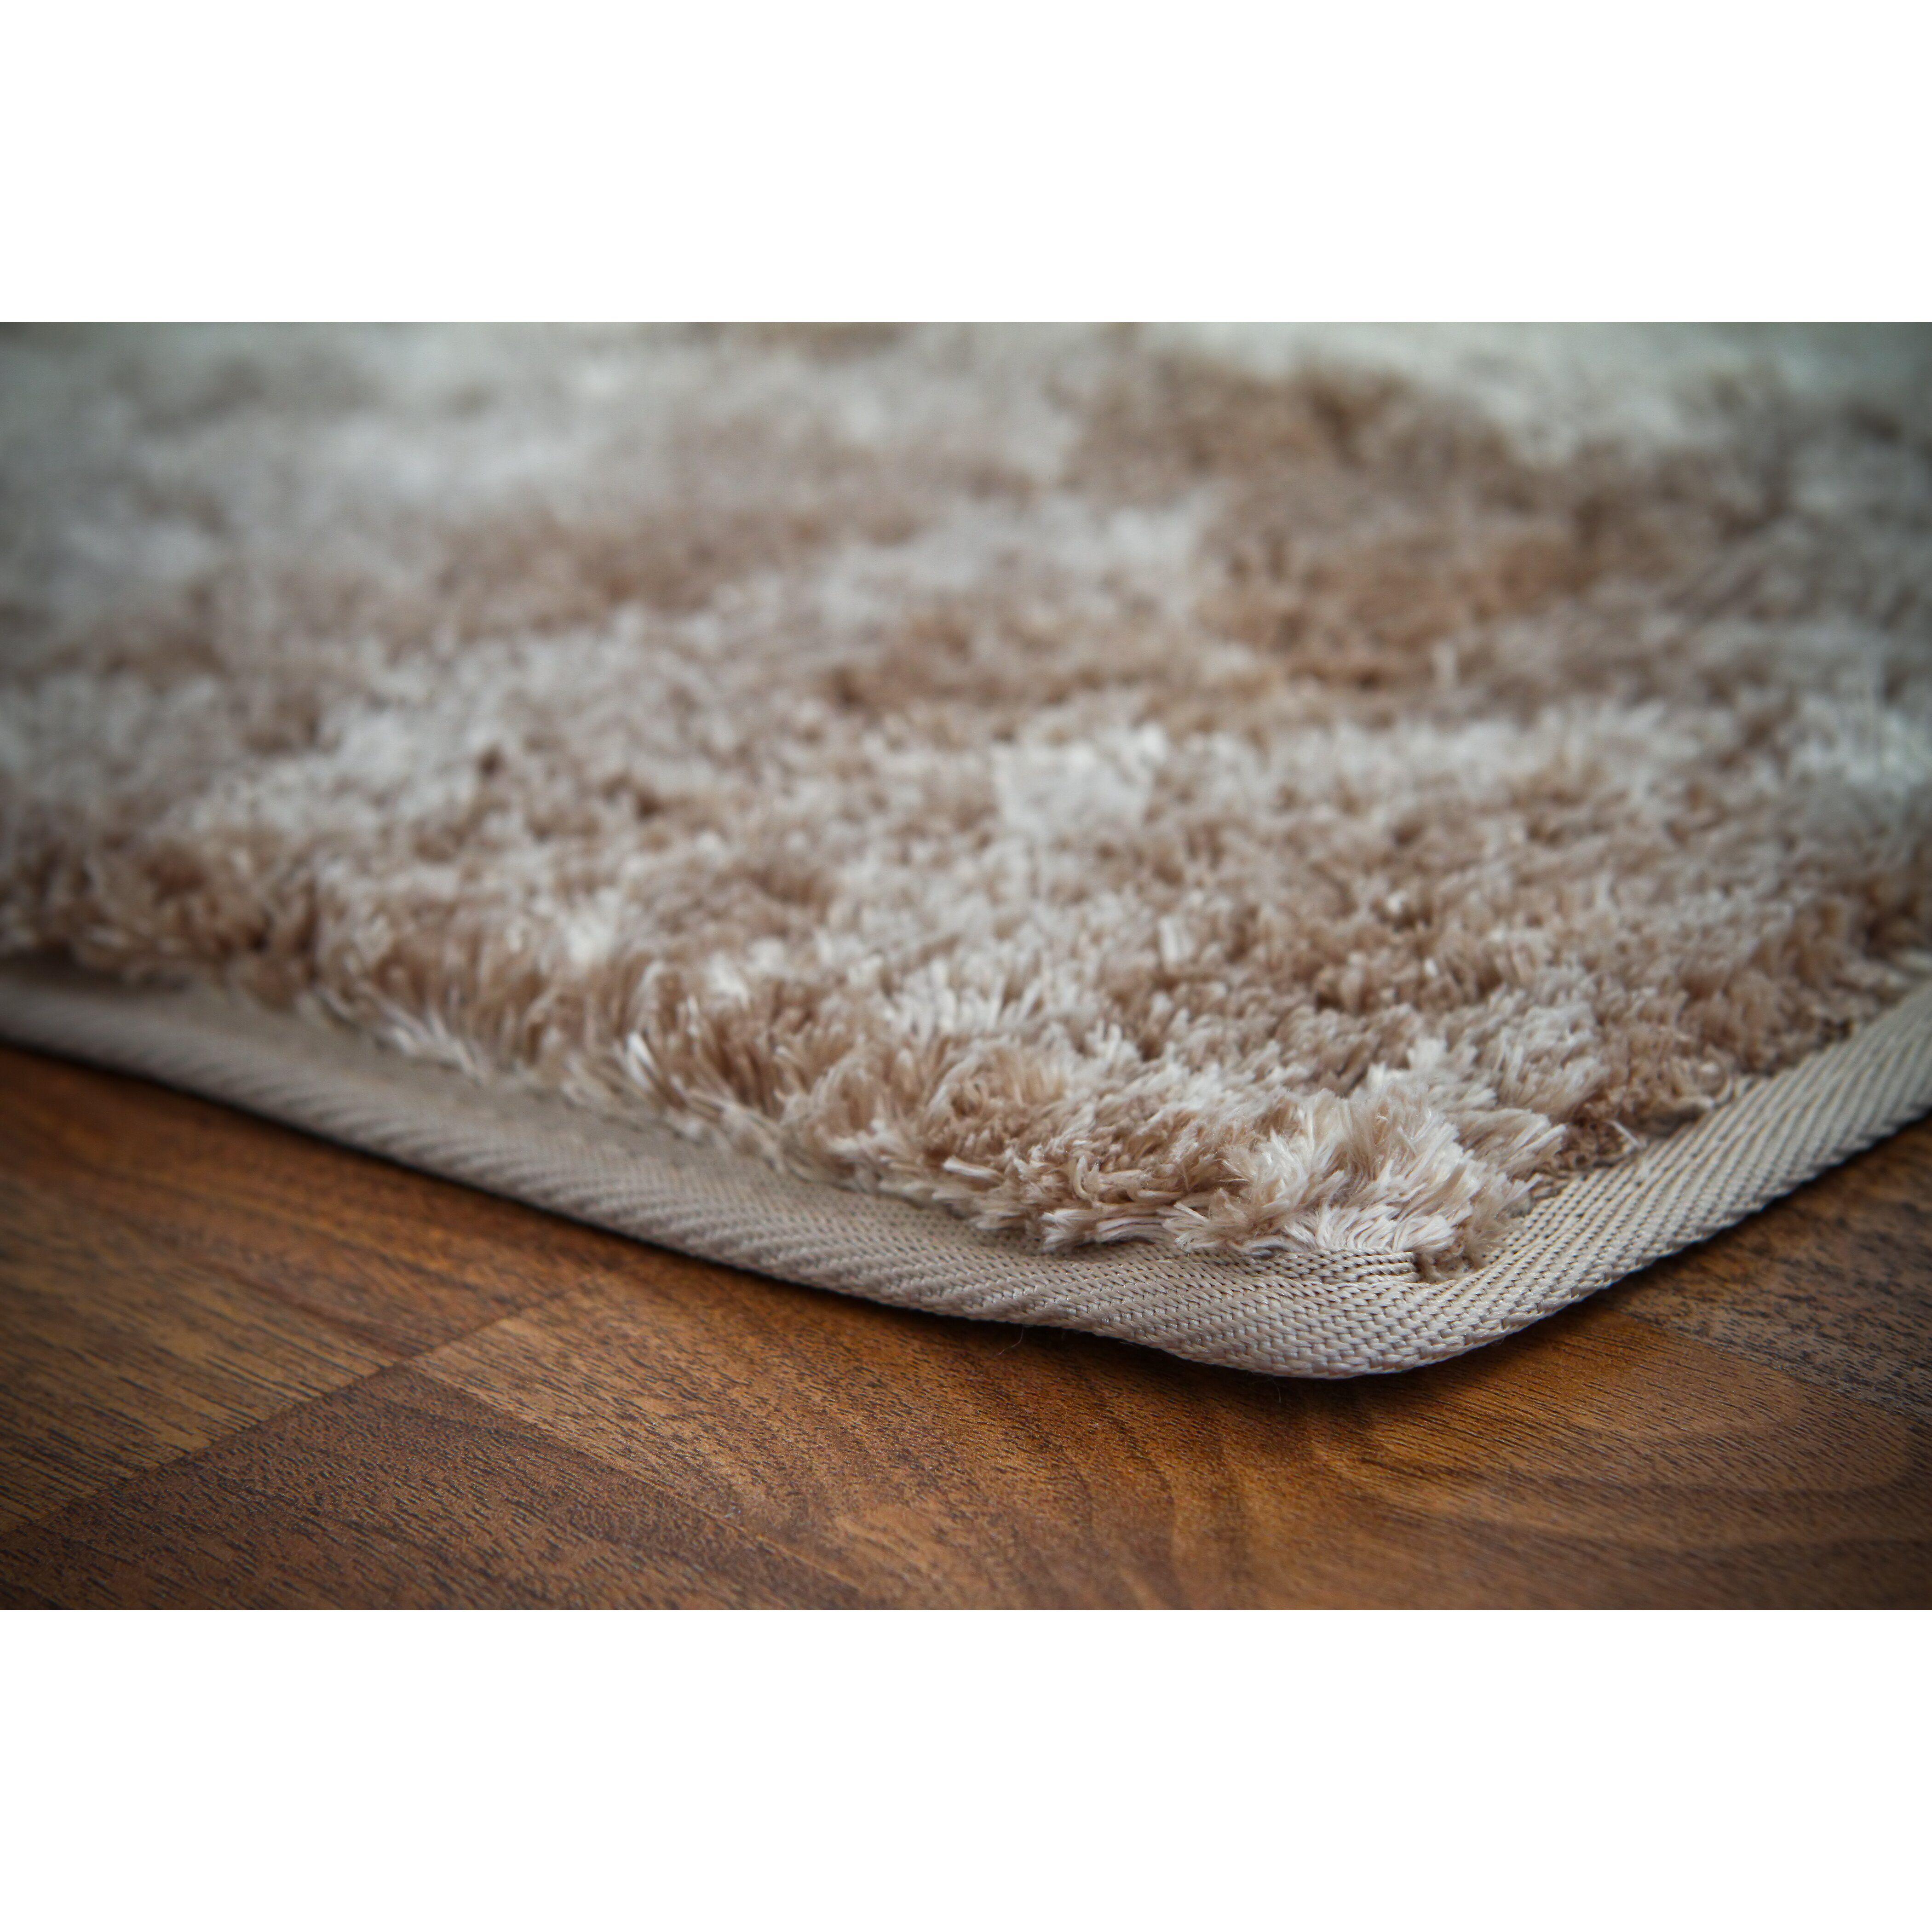 Bathroom Rugs Persian: Persian-rugs Bath Rug & Reviews